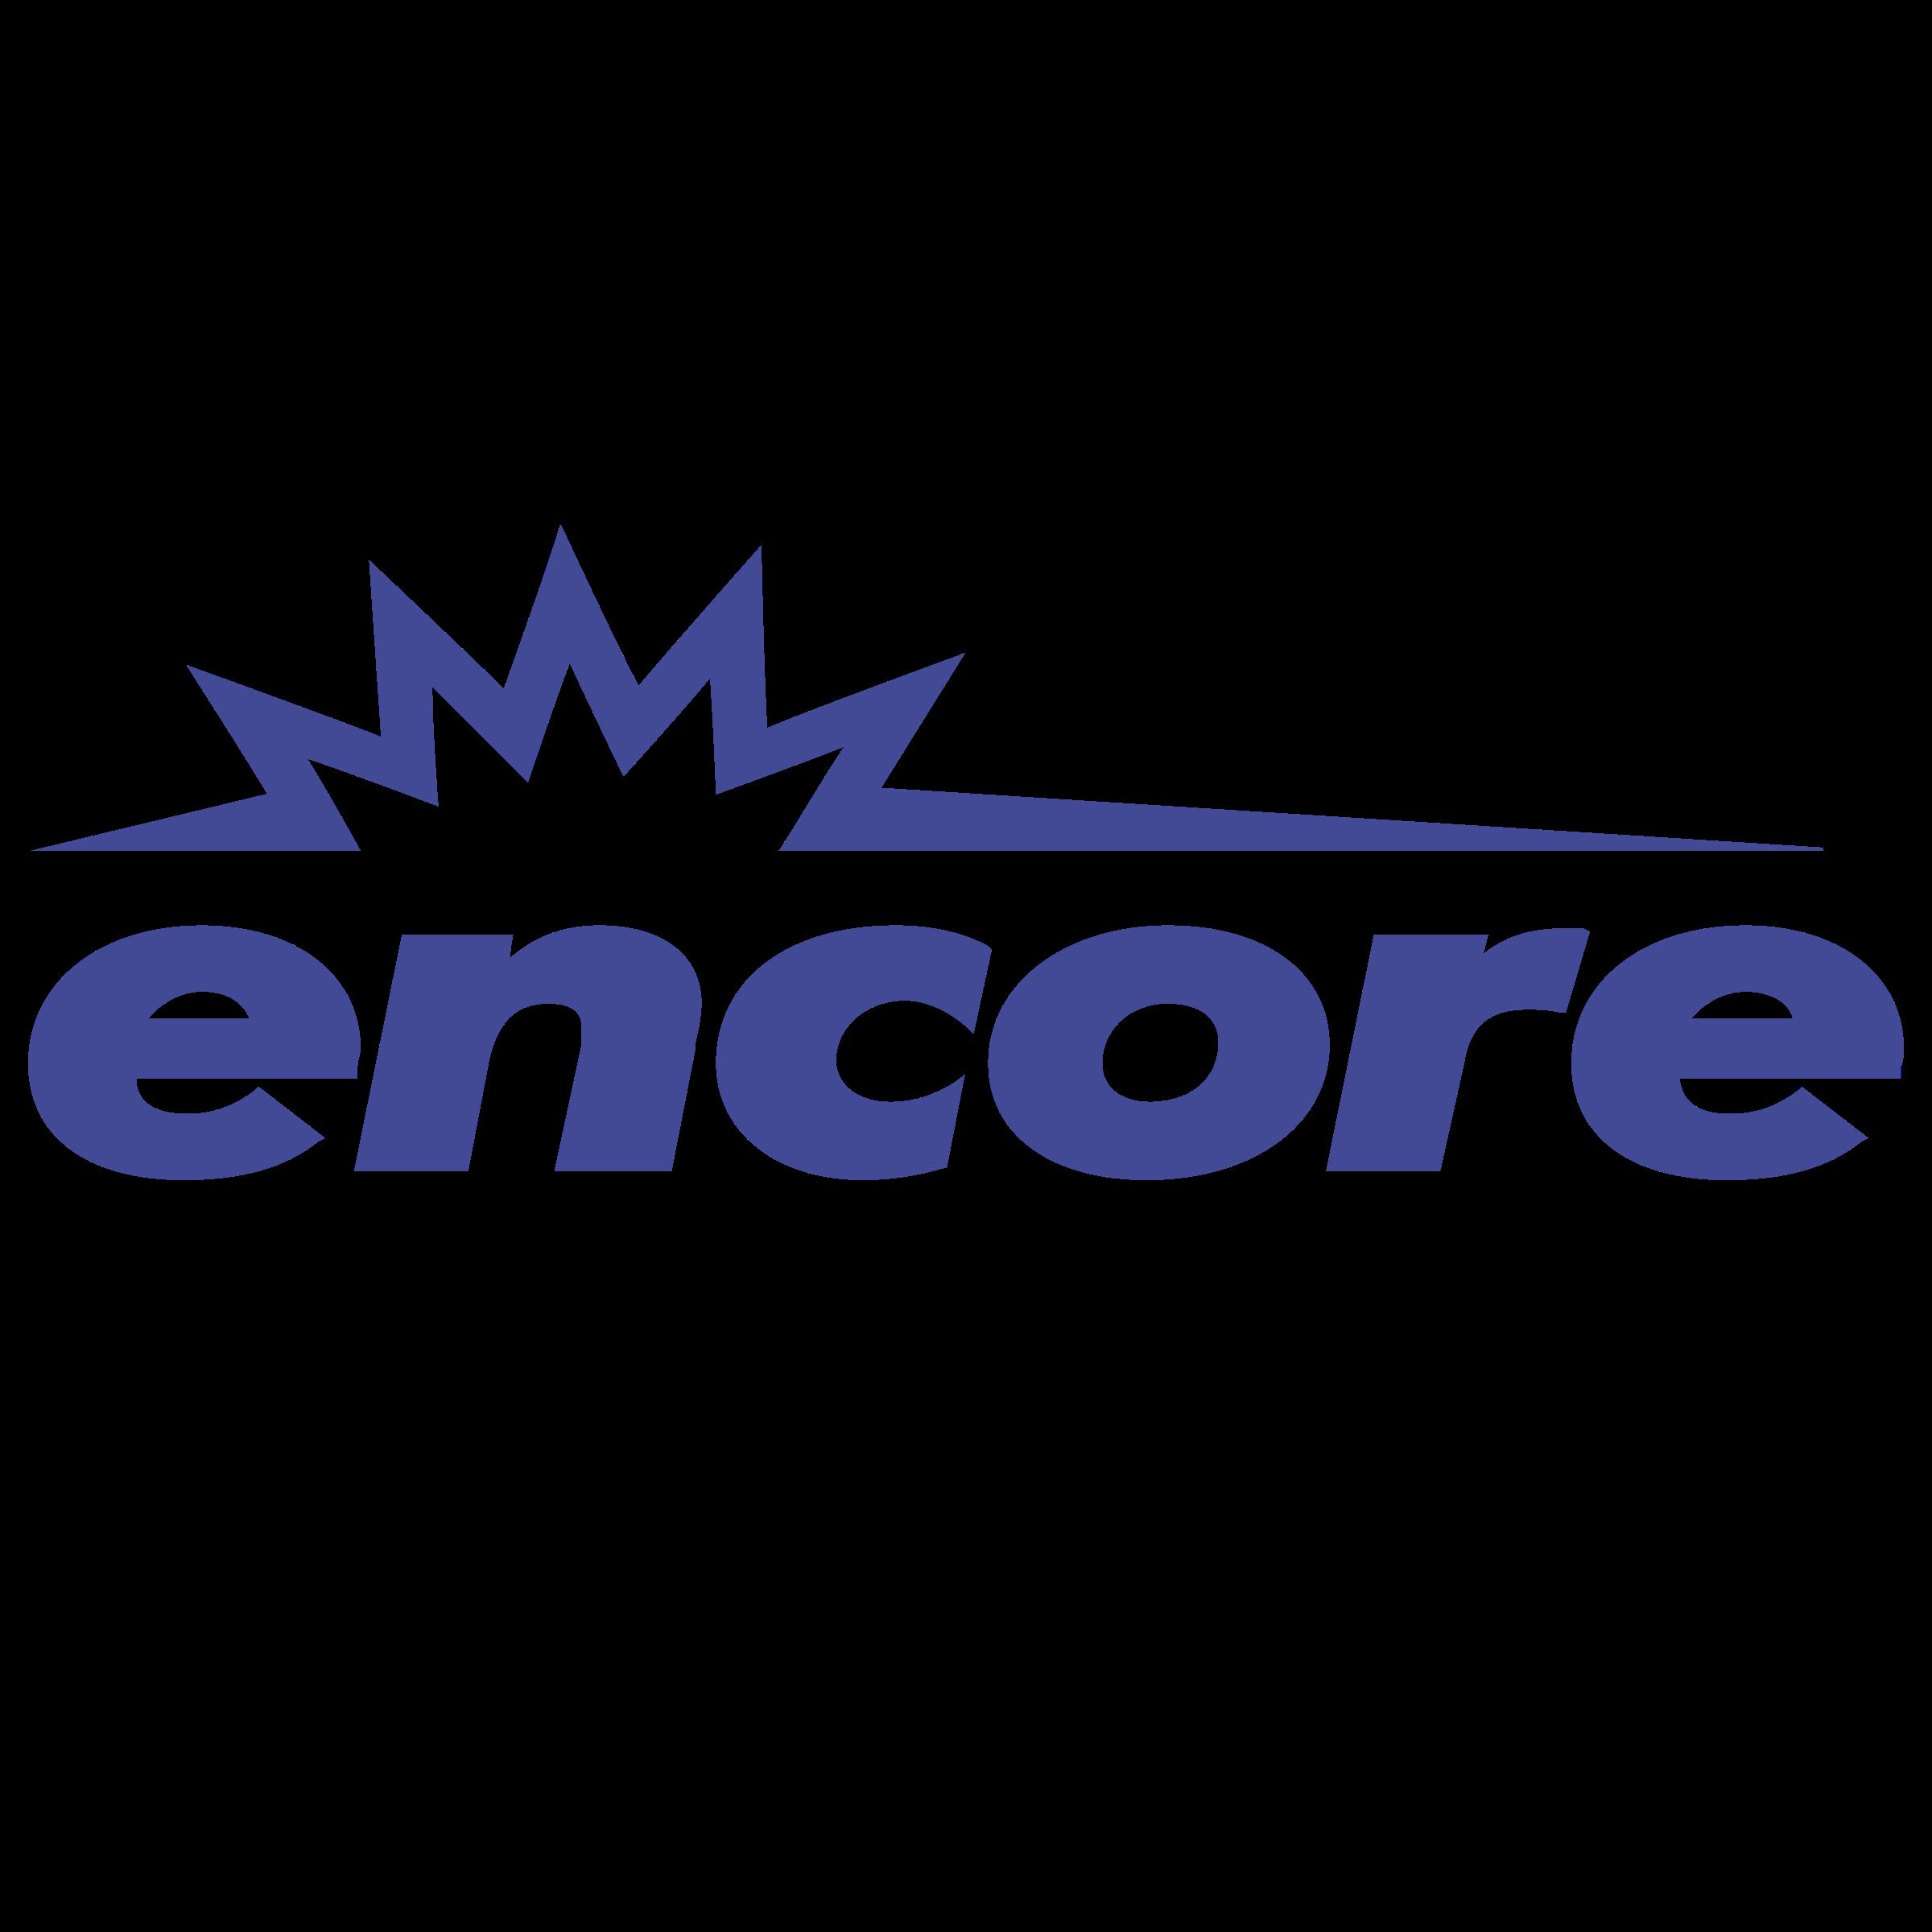 ear marketing download logo miracle